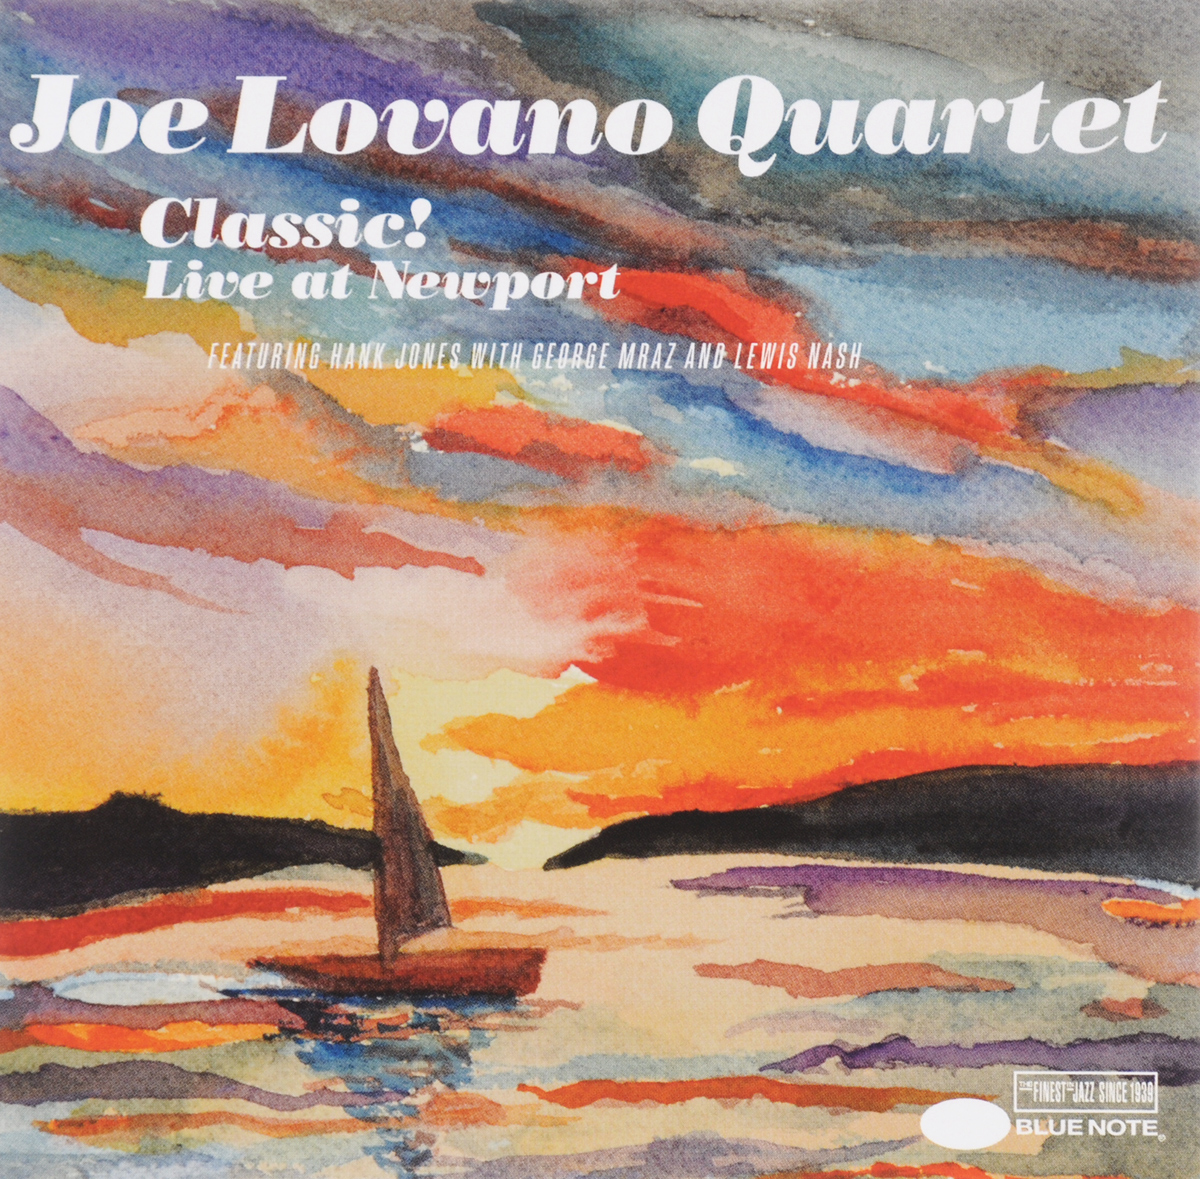 Joe Lovano Quartets Joe Lovano Quartet. Classic. Live At Newport anshmei at 10 blue